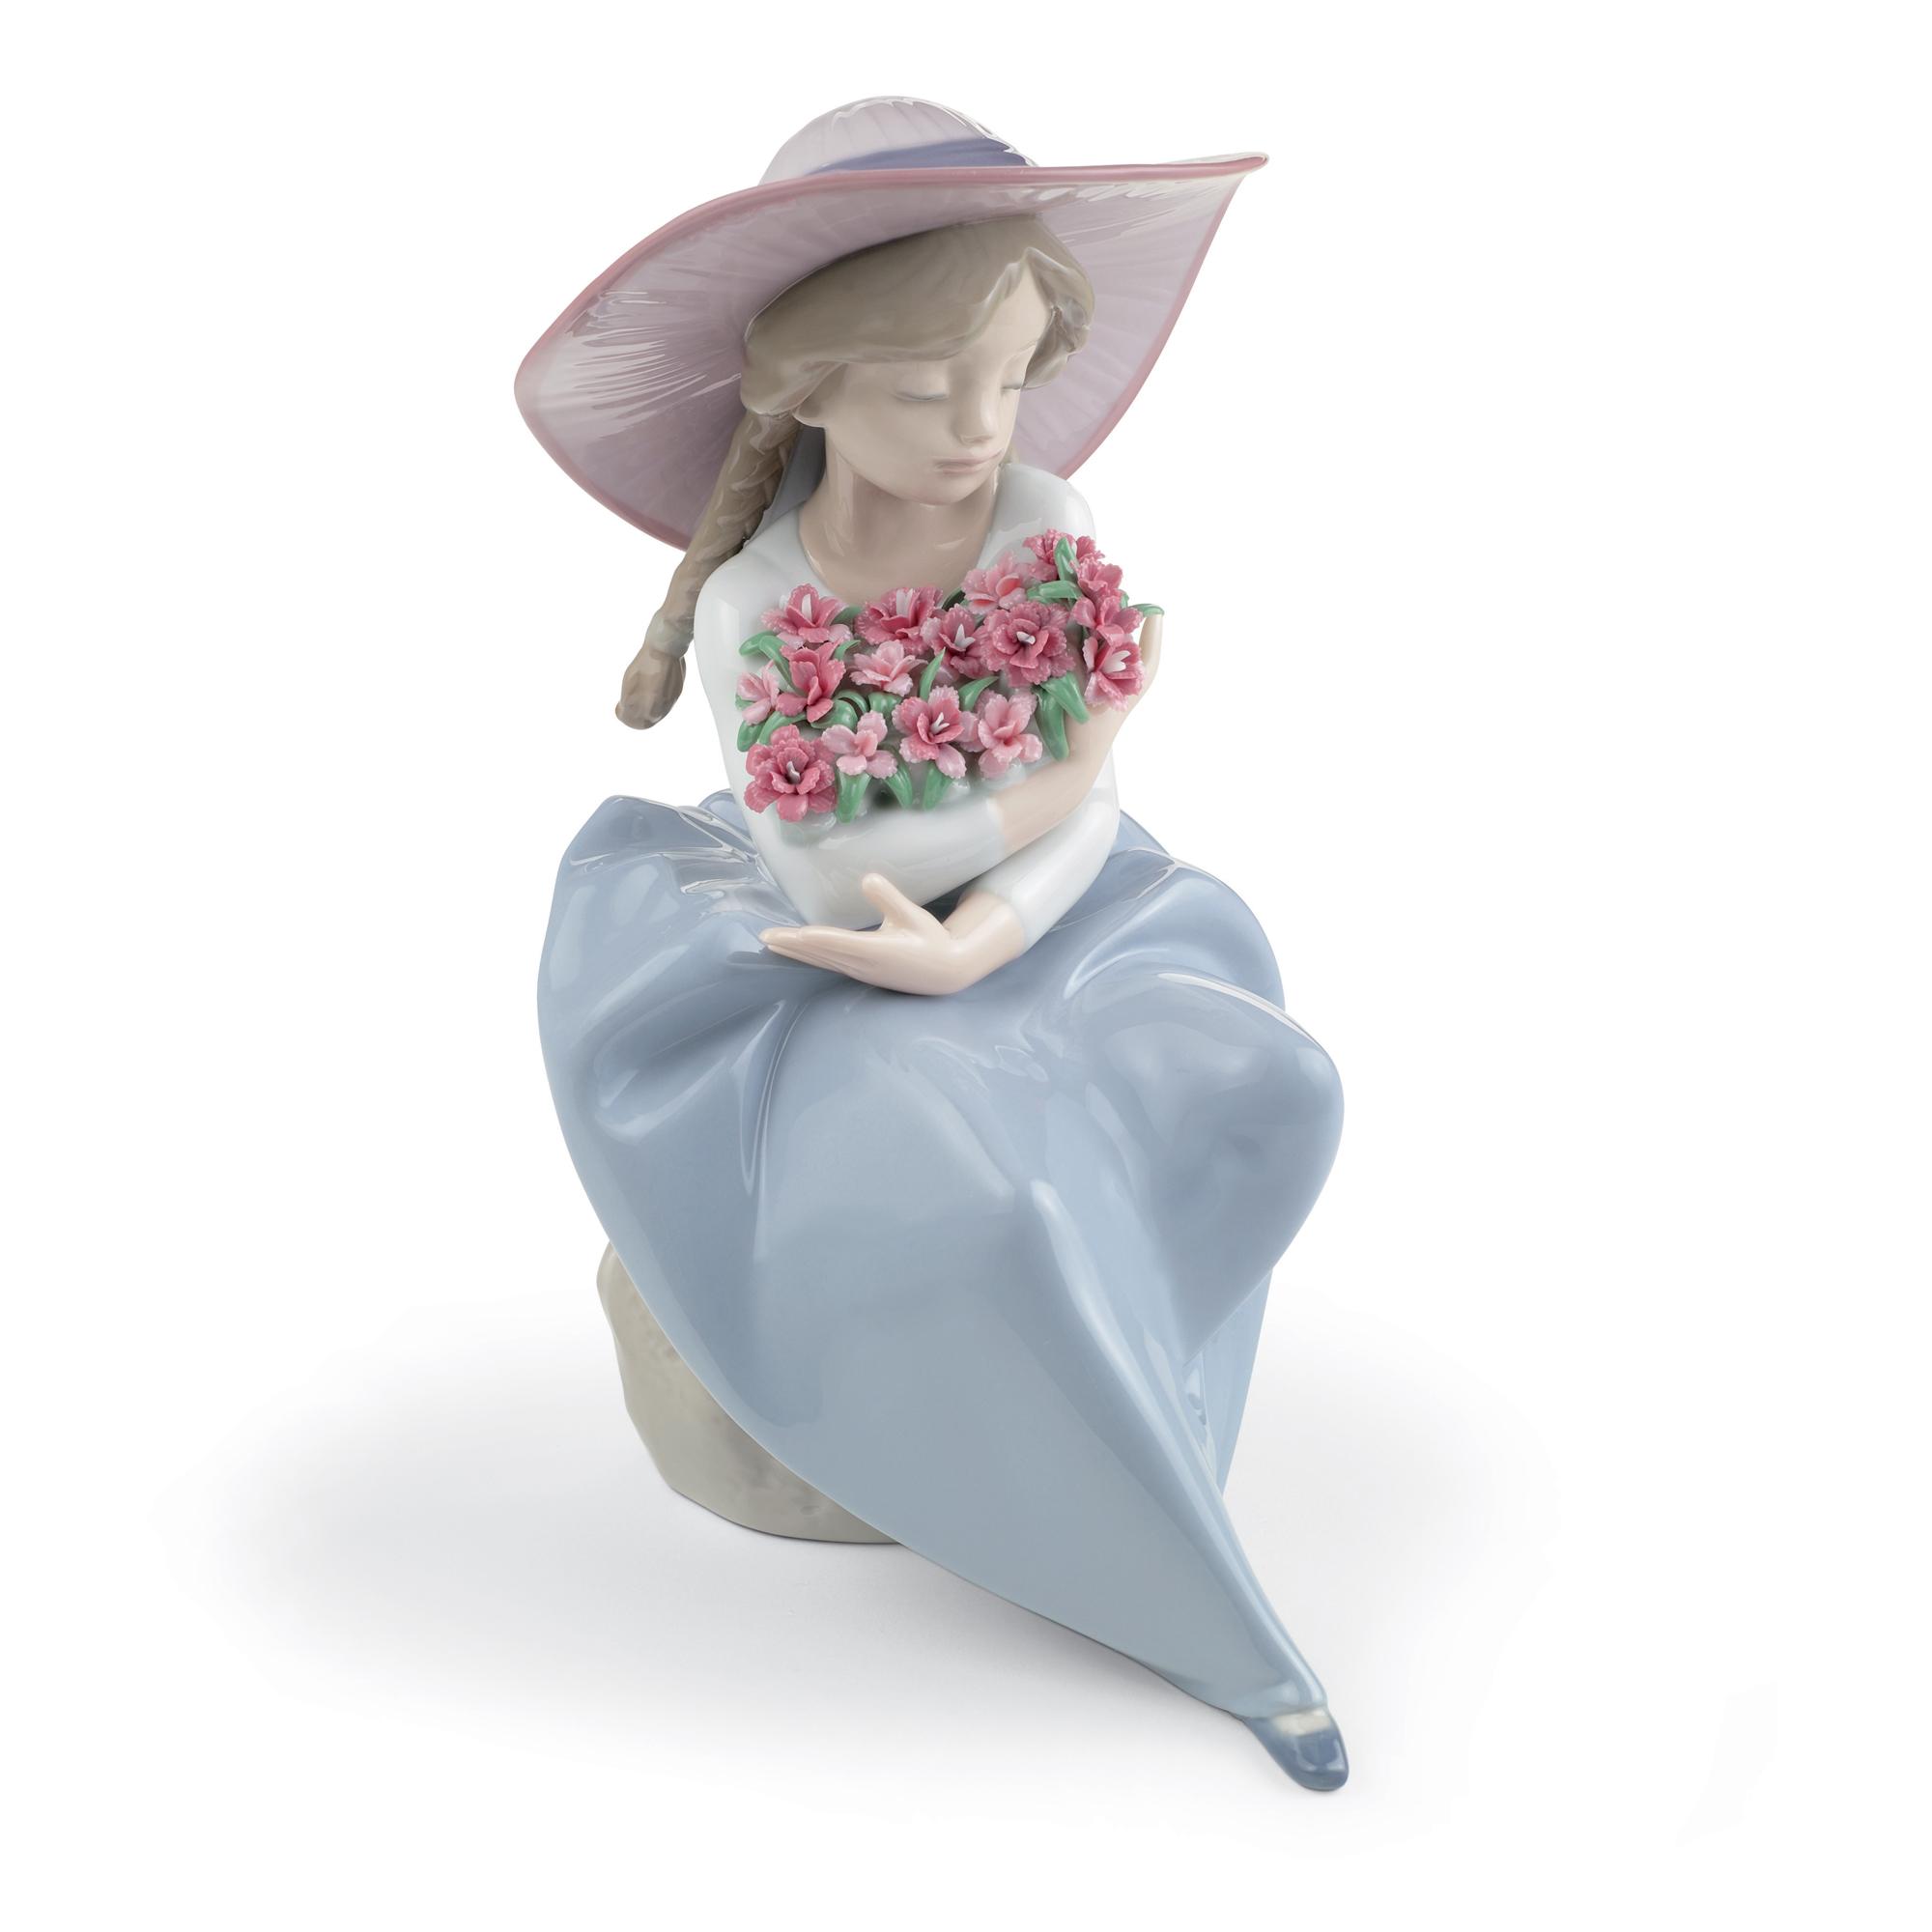 Fragrant Bouquet (Carnations) 1007215 - Lladro Children